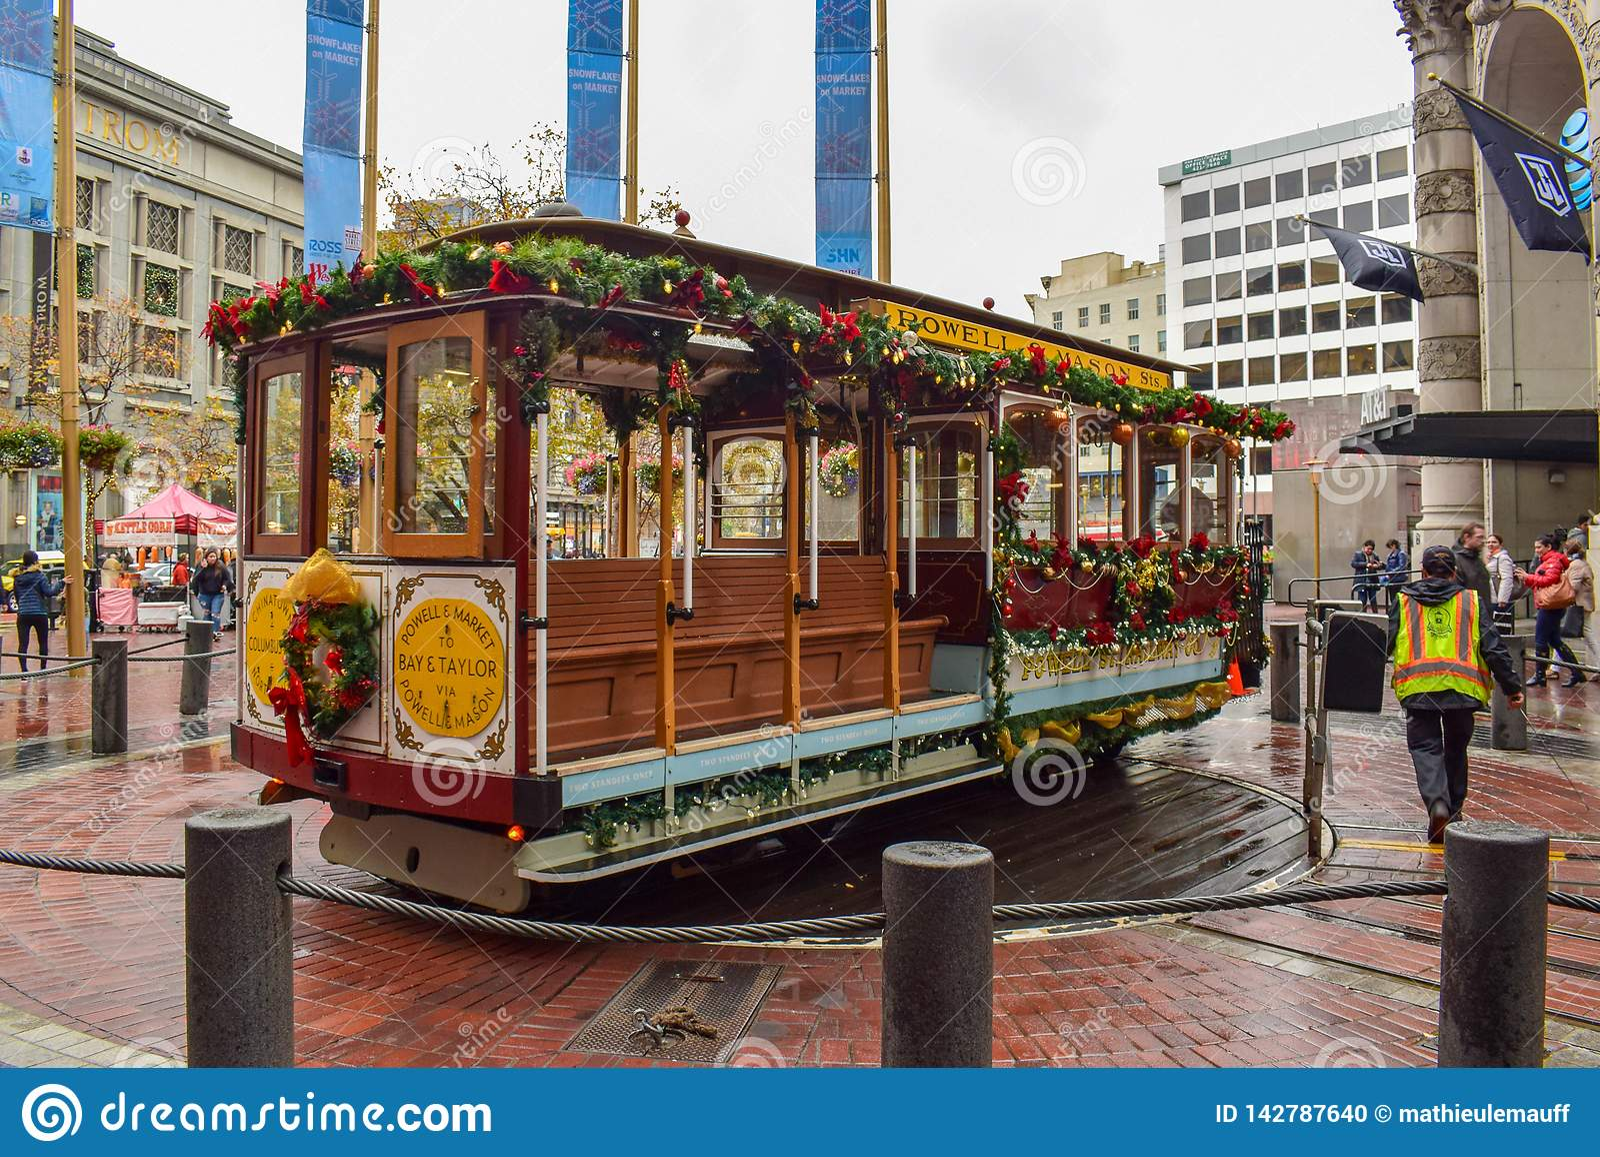 Kerstmis Verfraaid San Francisco Historical Cable Car